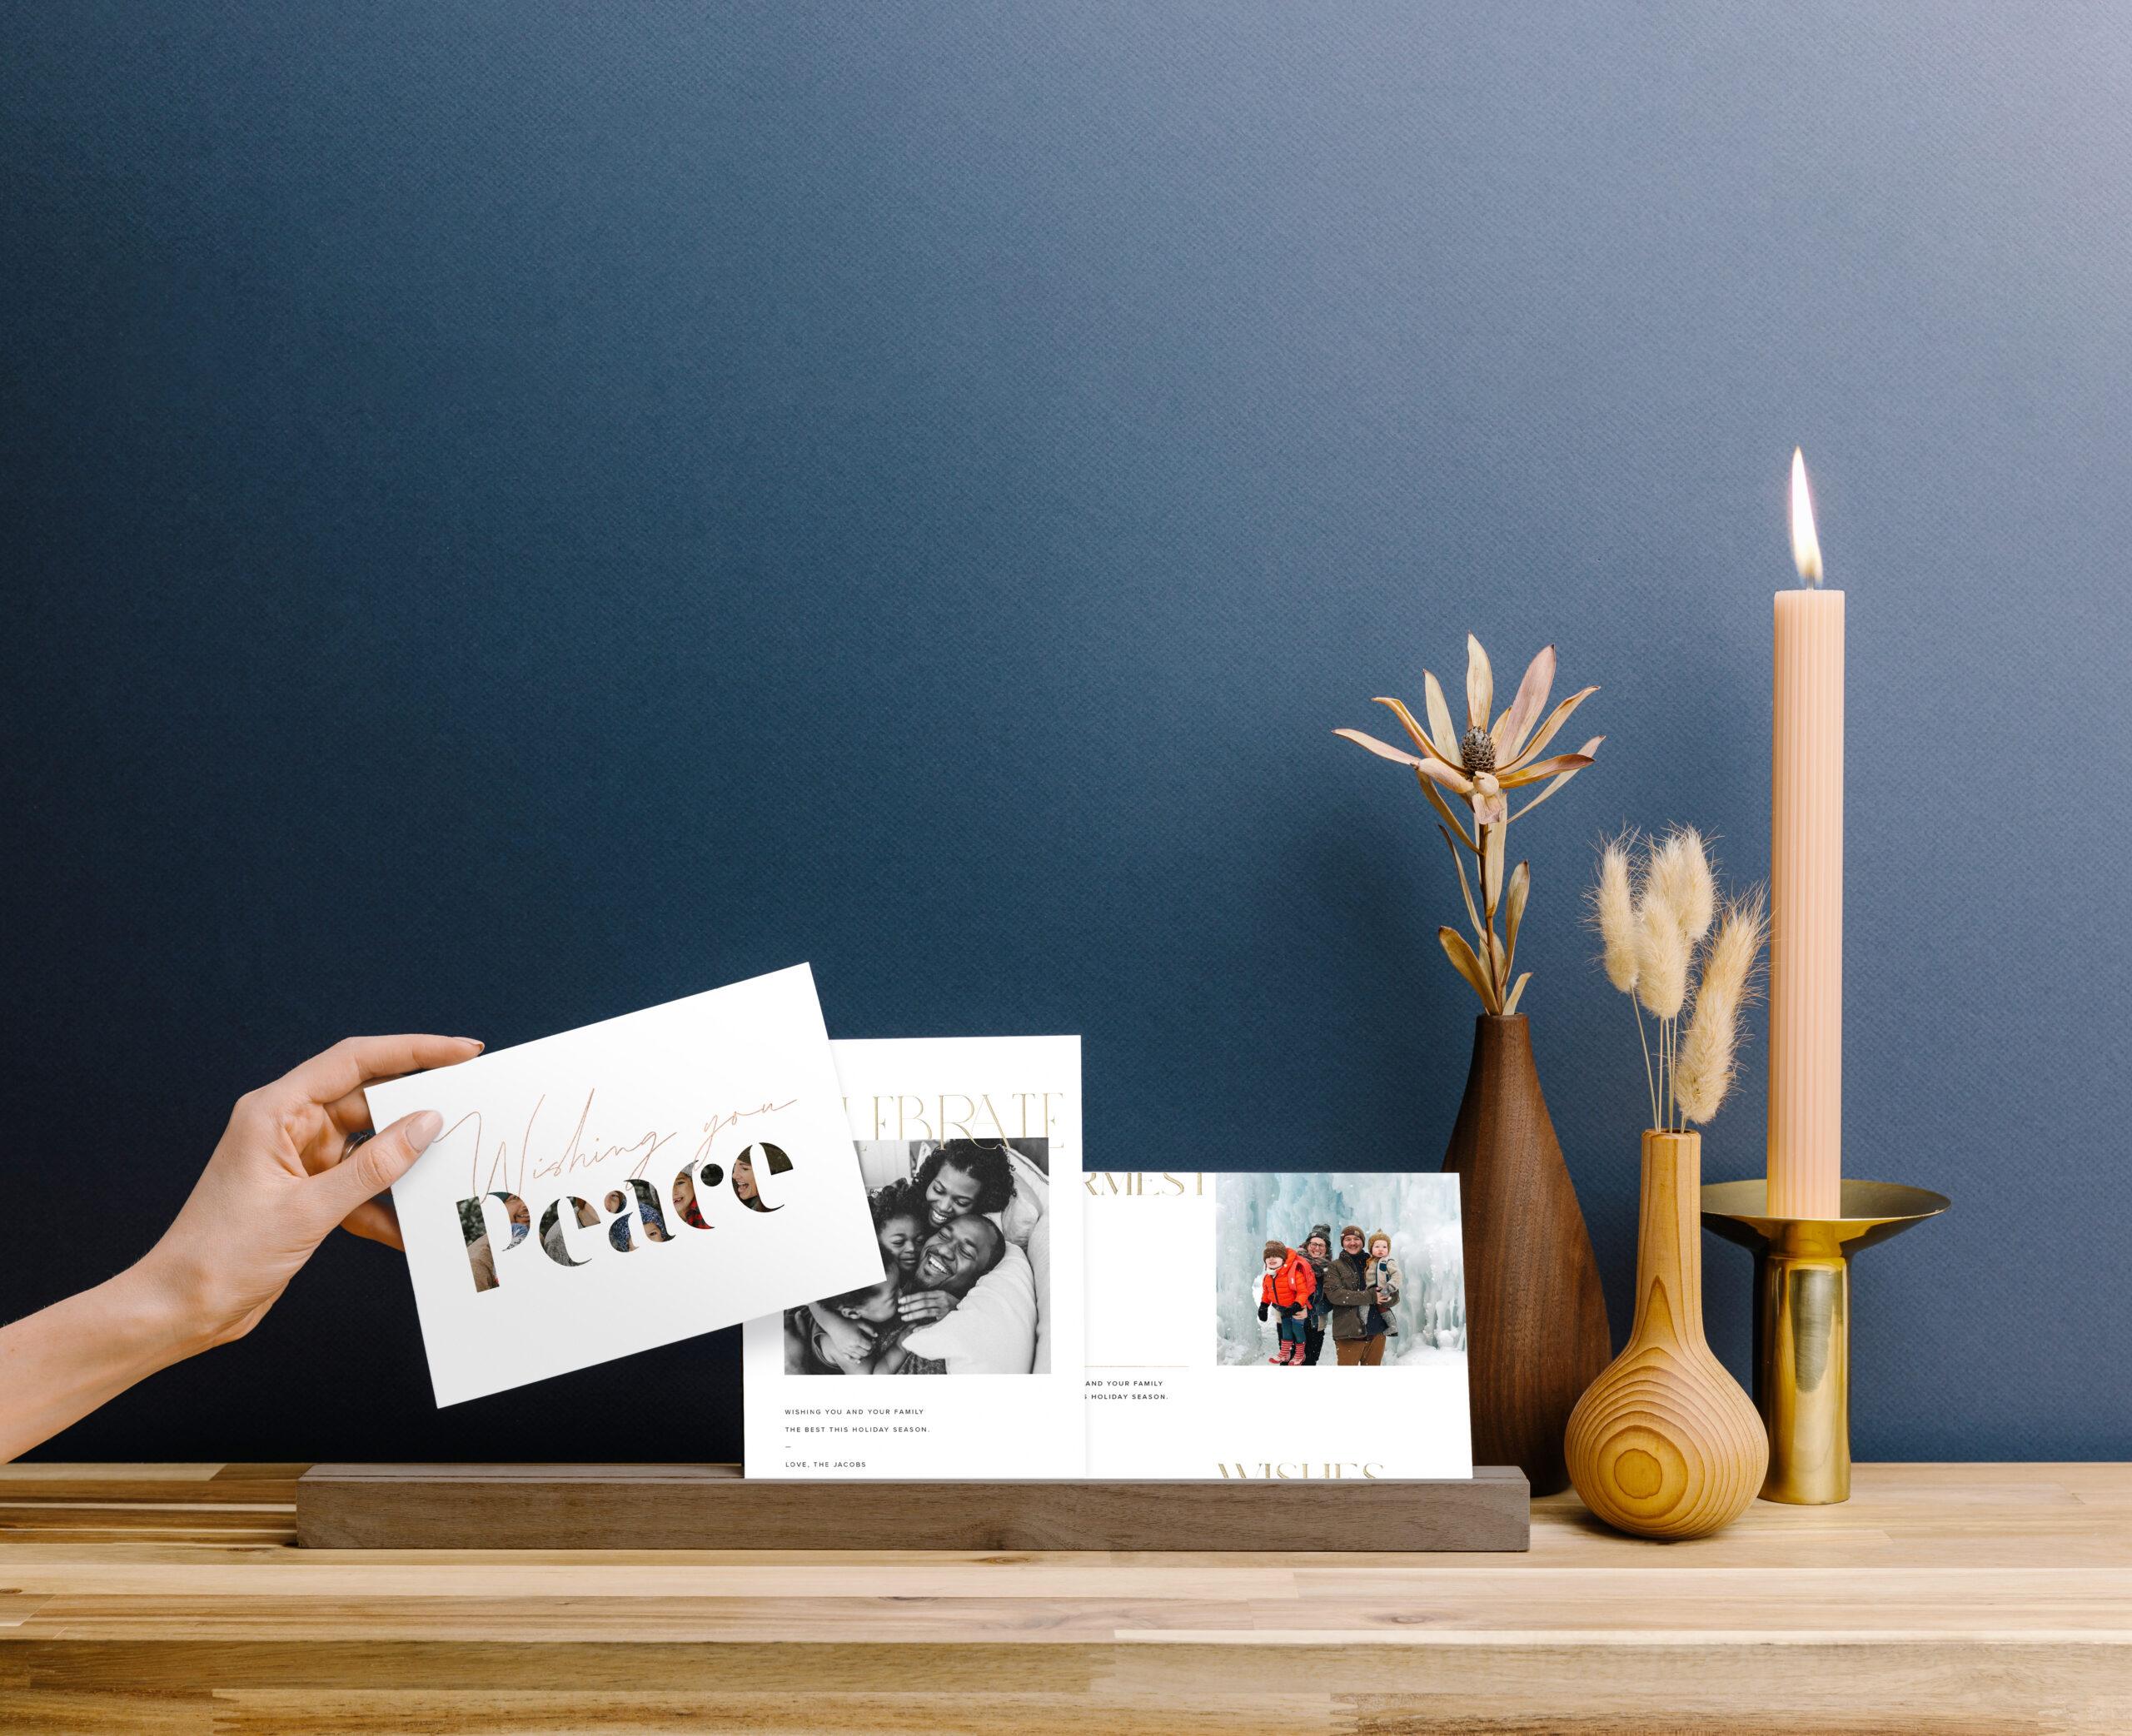 20191002-holiday-cards-in-wood-ledge-on-shelf